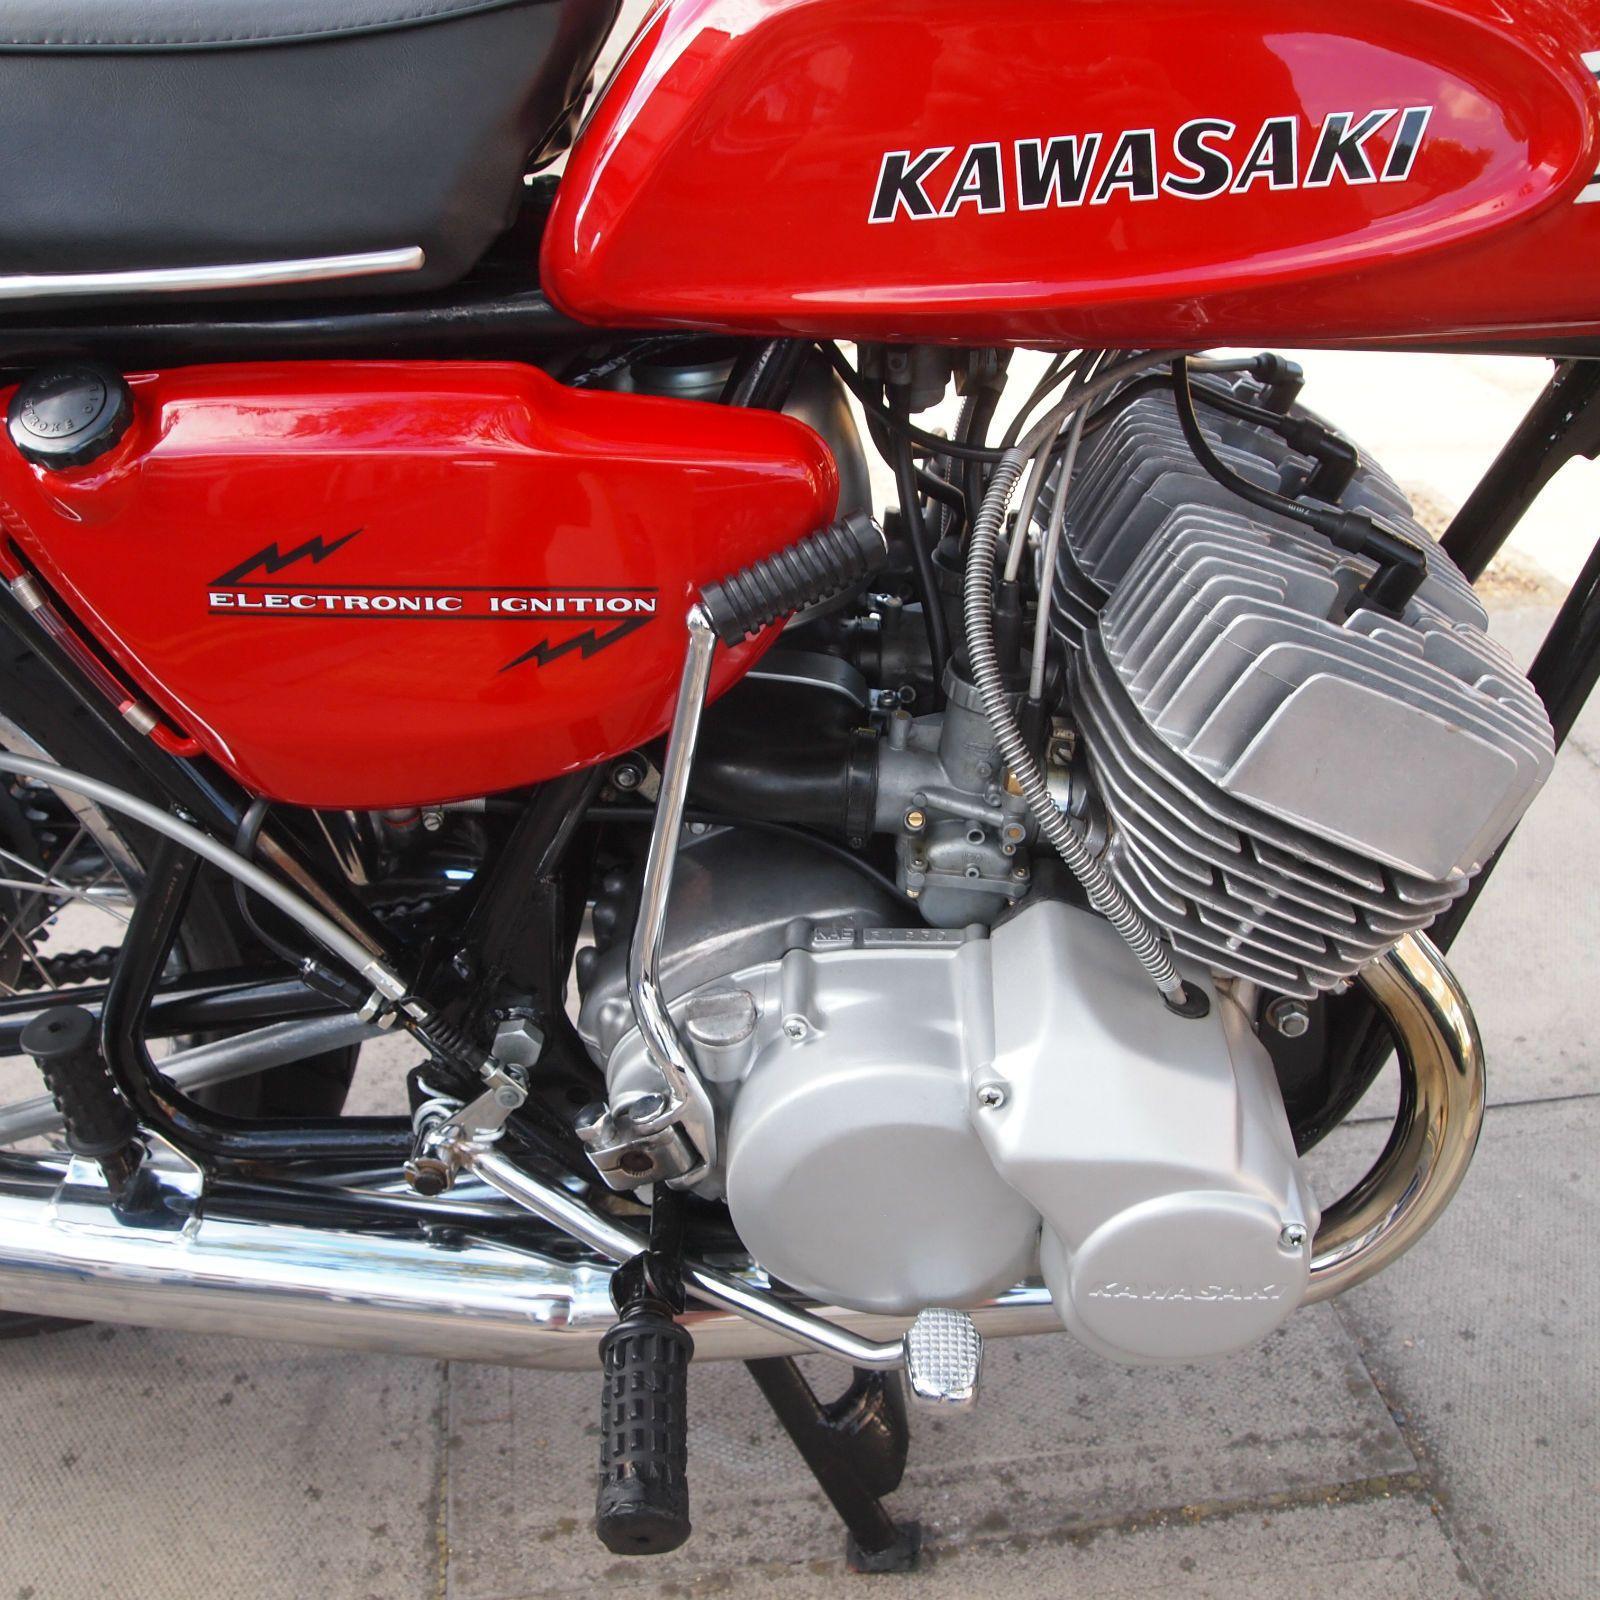 Details about 1970 Kawasaki H1 Mach 111 500 Classic Vintage